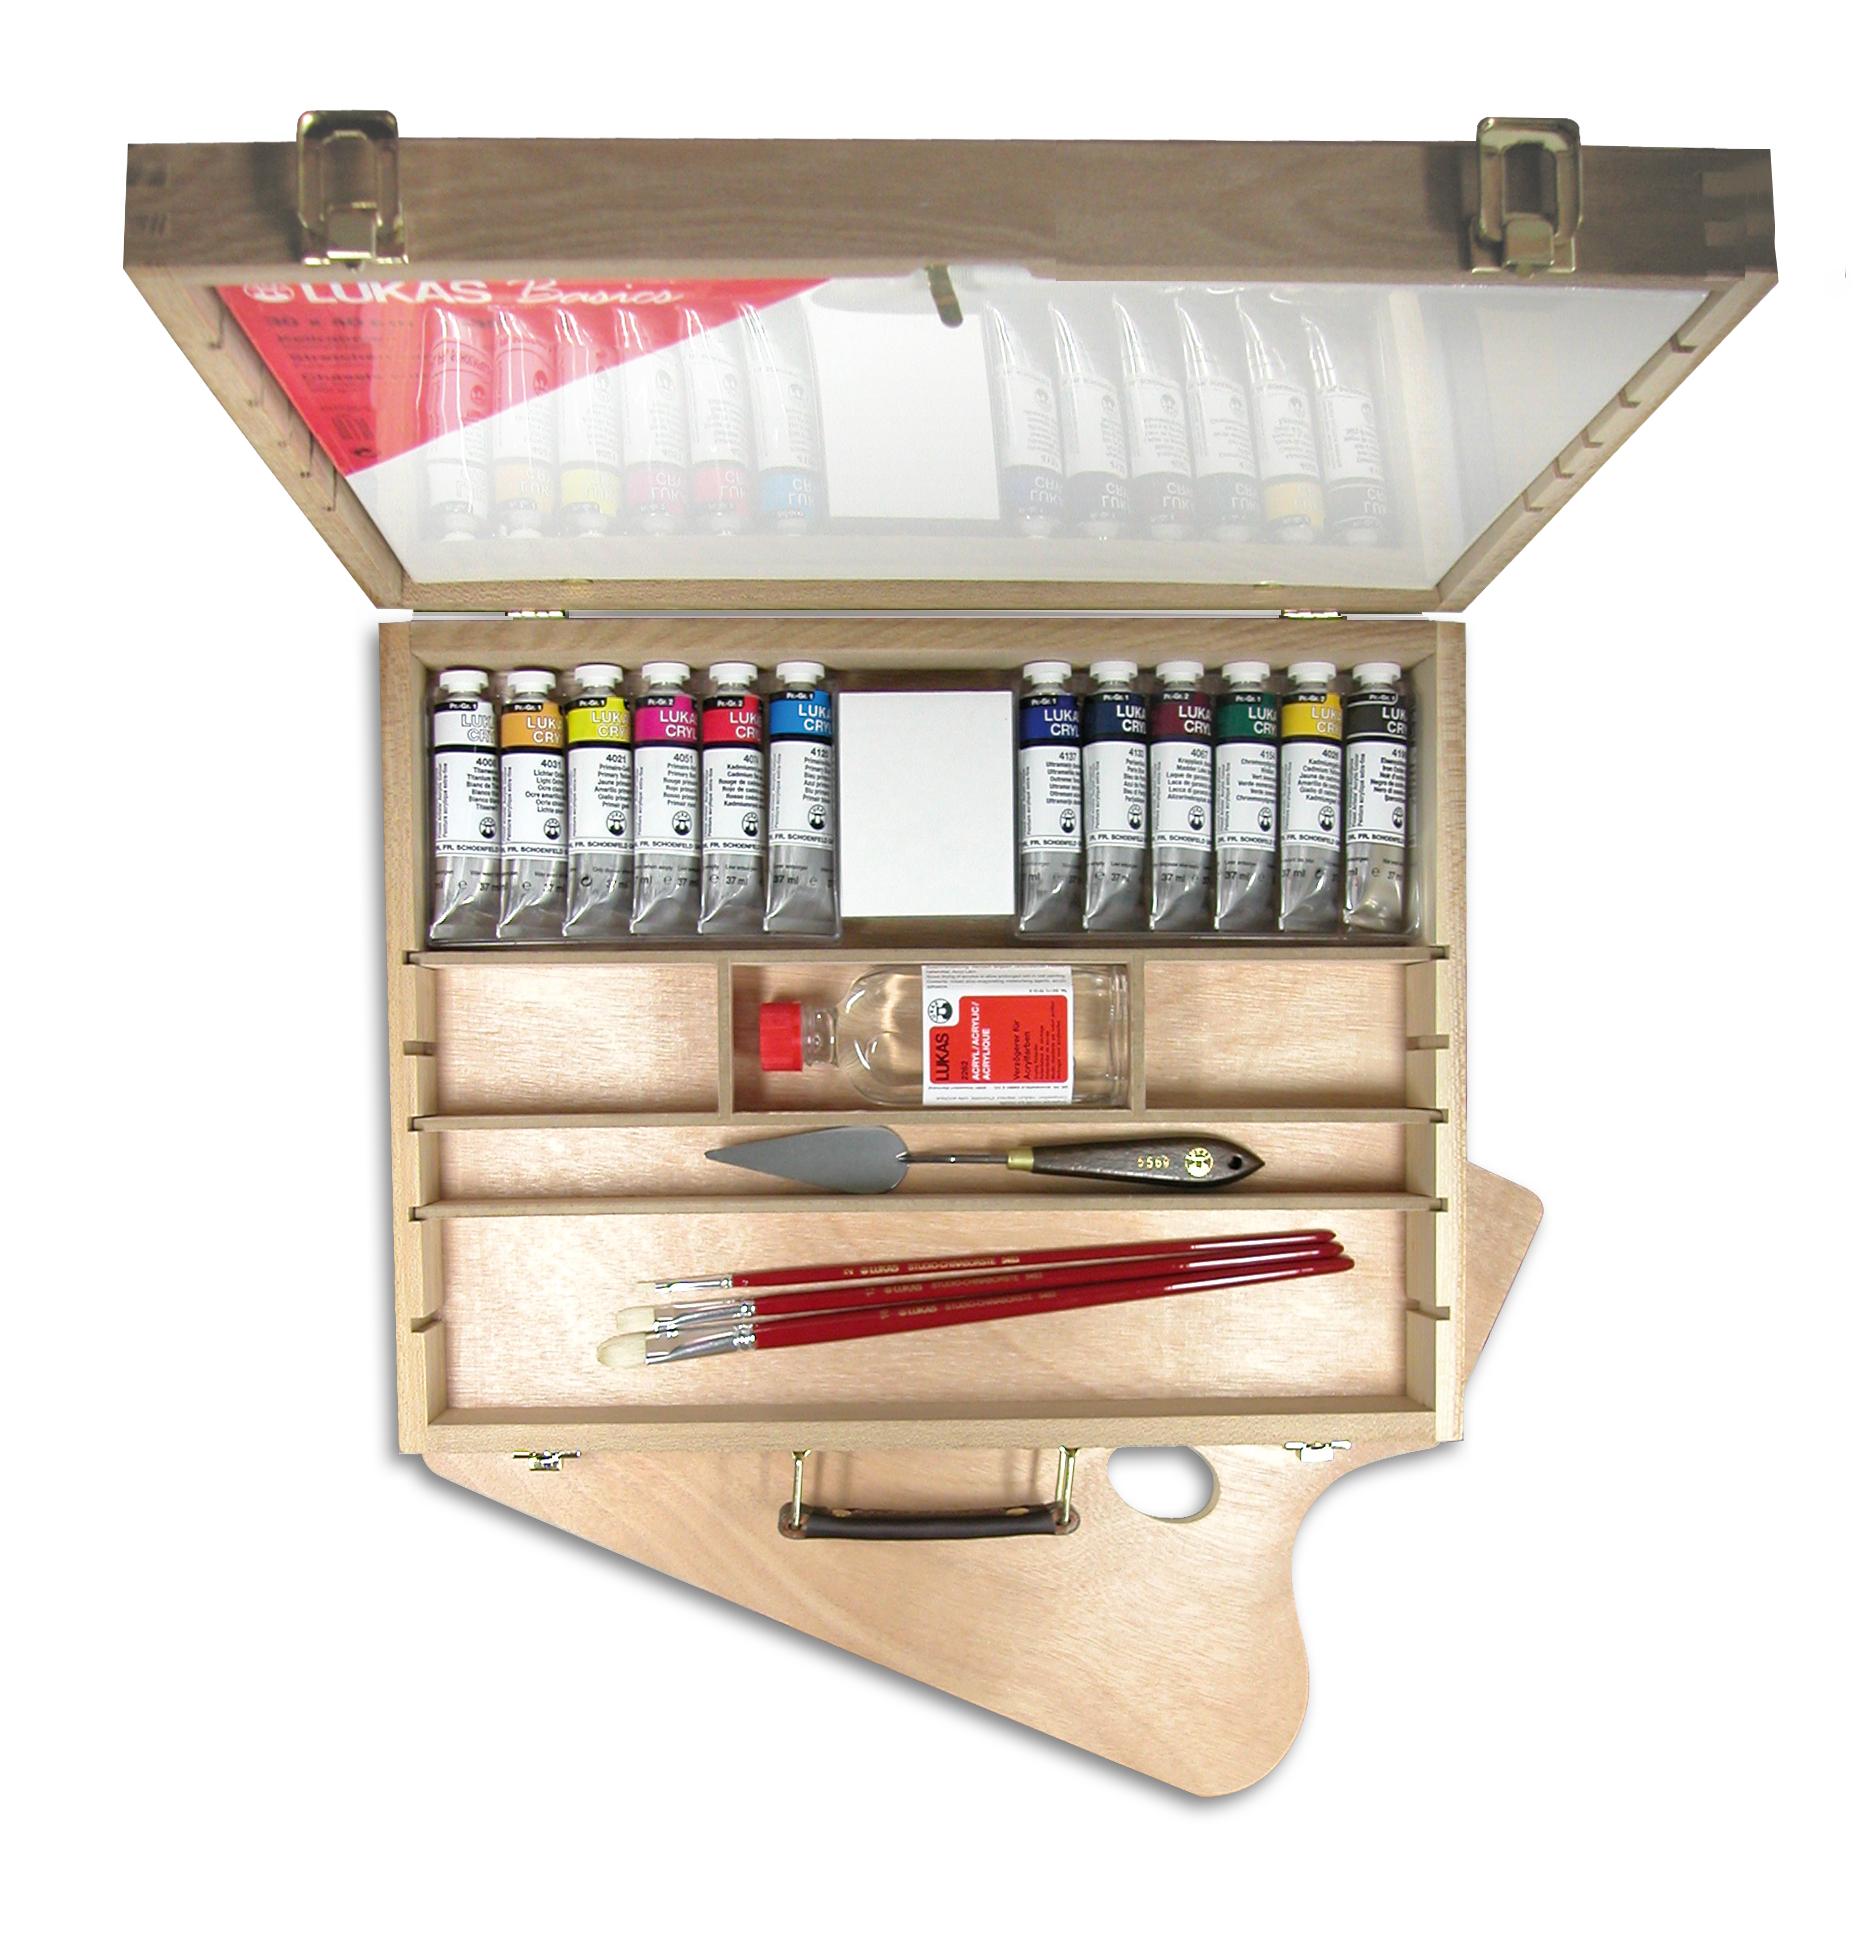 Lukas Cryl Pastos - Acrylfarben im Holzkoffer groß